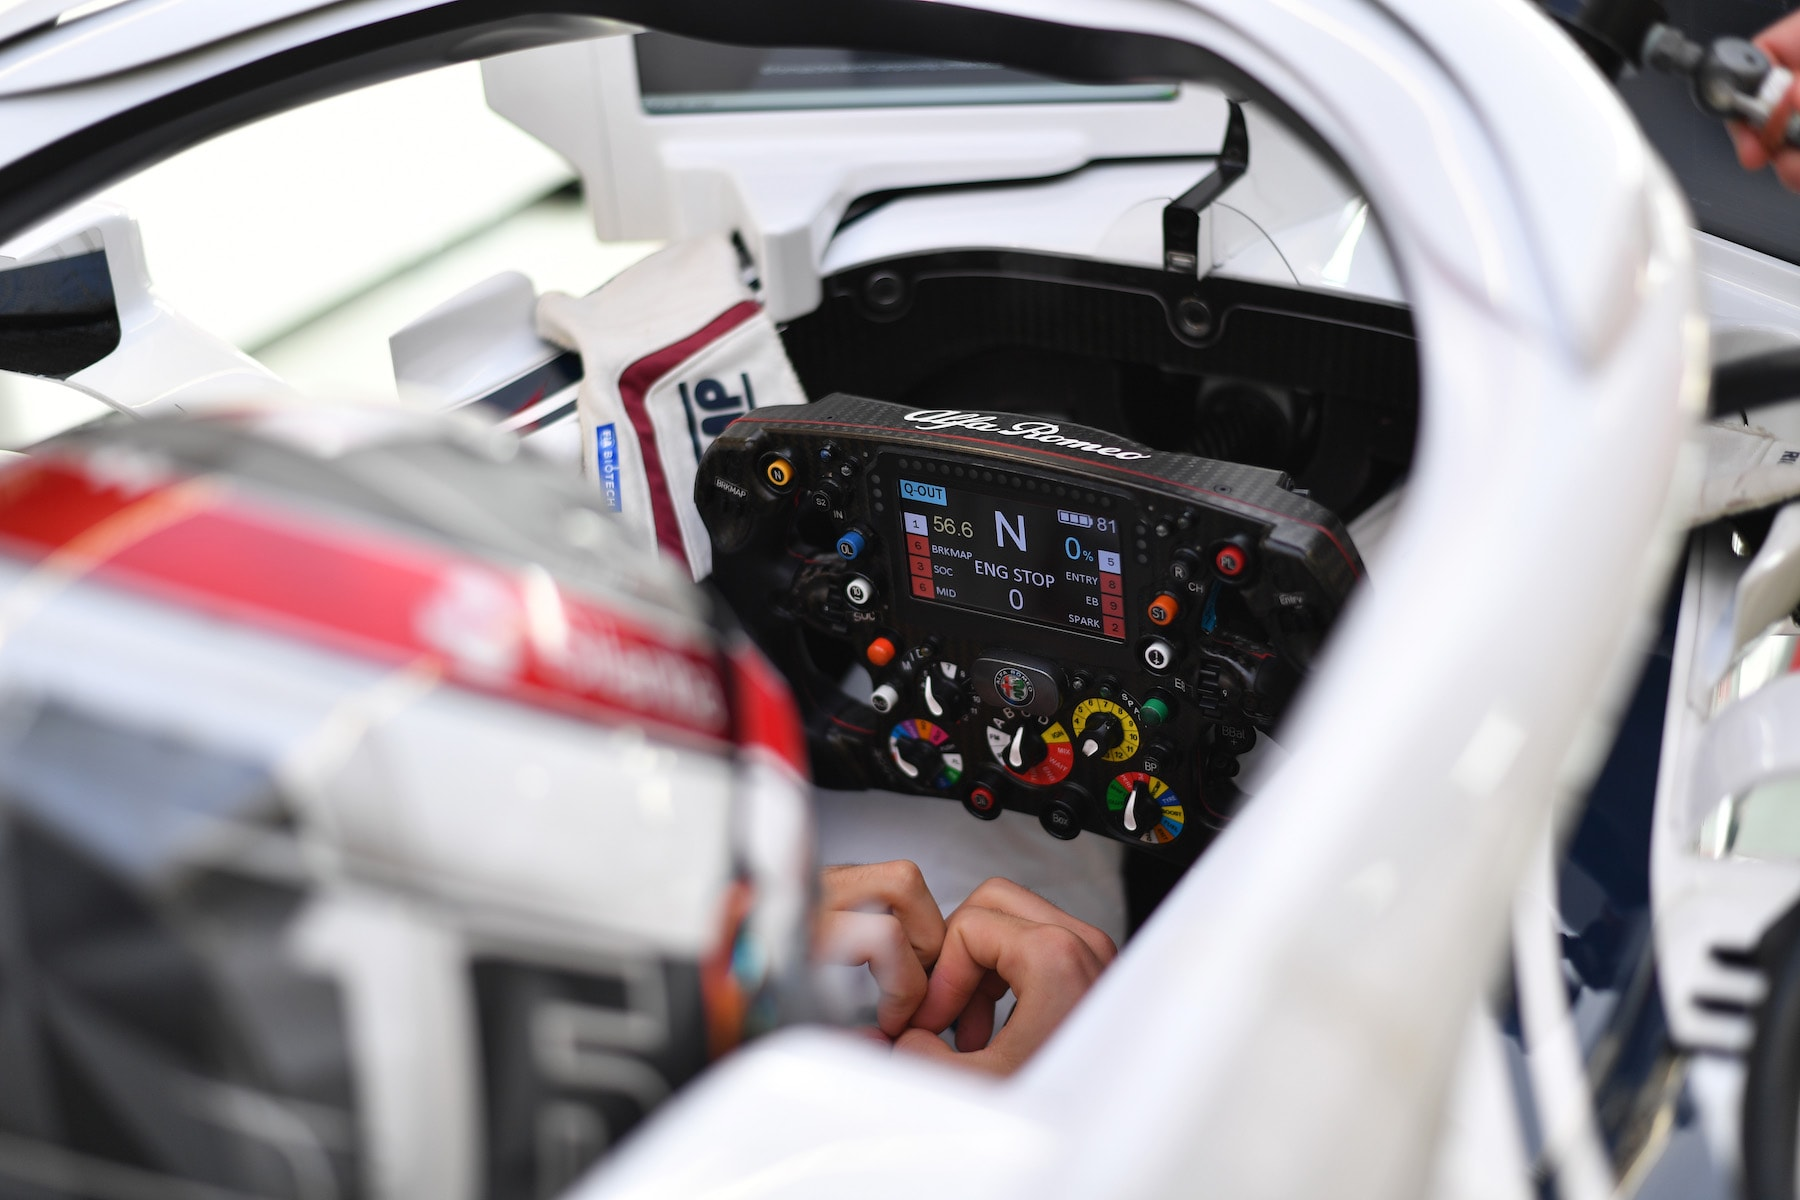 2 2018 Charles Leclerc | Sauber C37 | 2018 Brazilian GP 4 copy.jpg